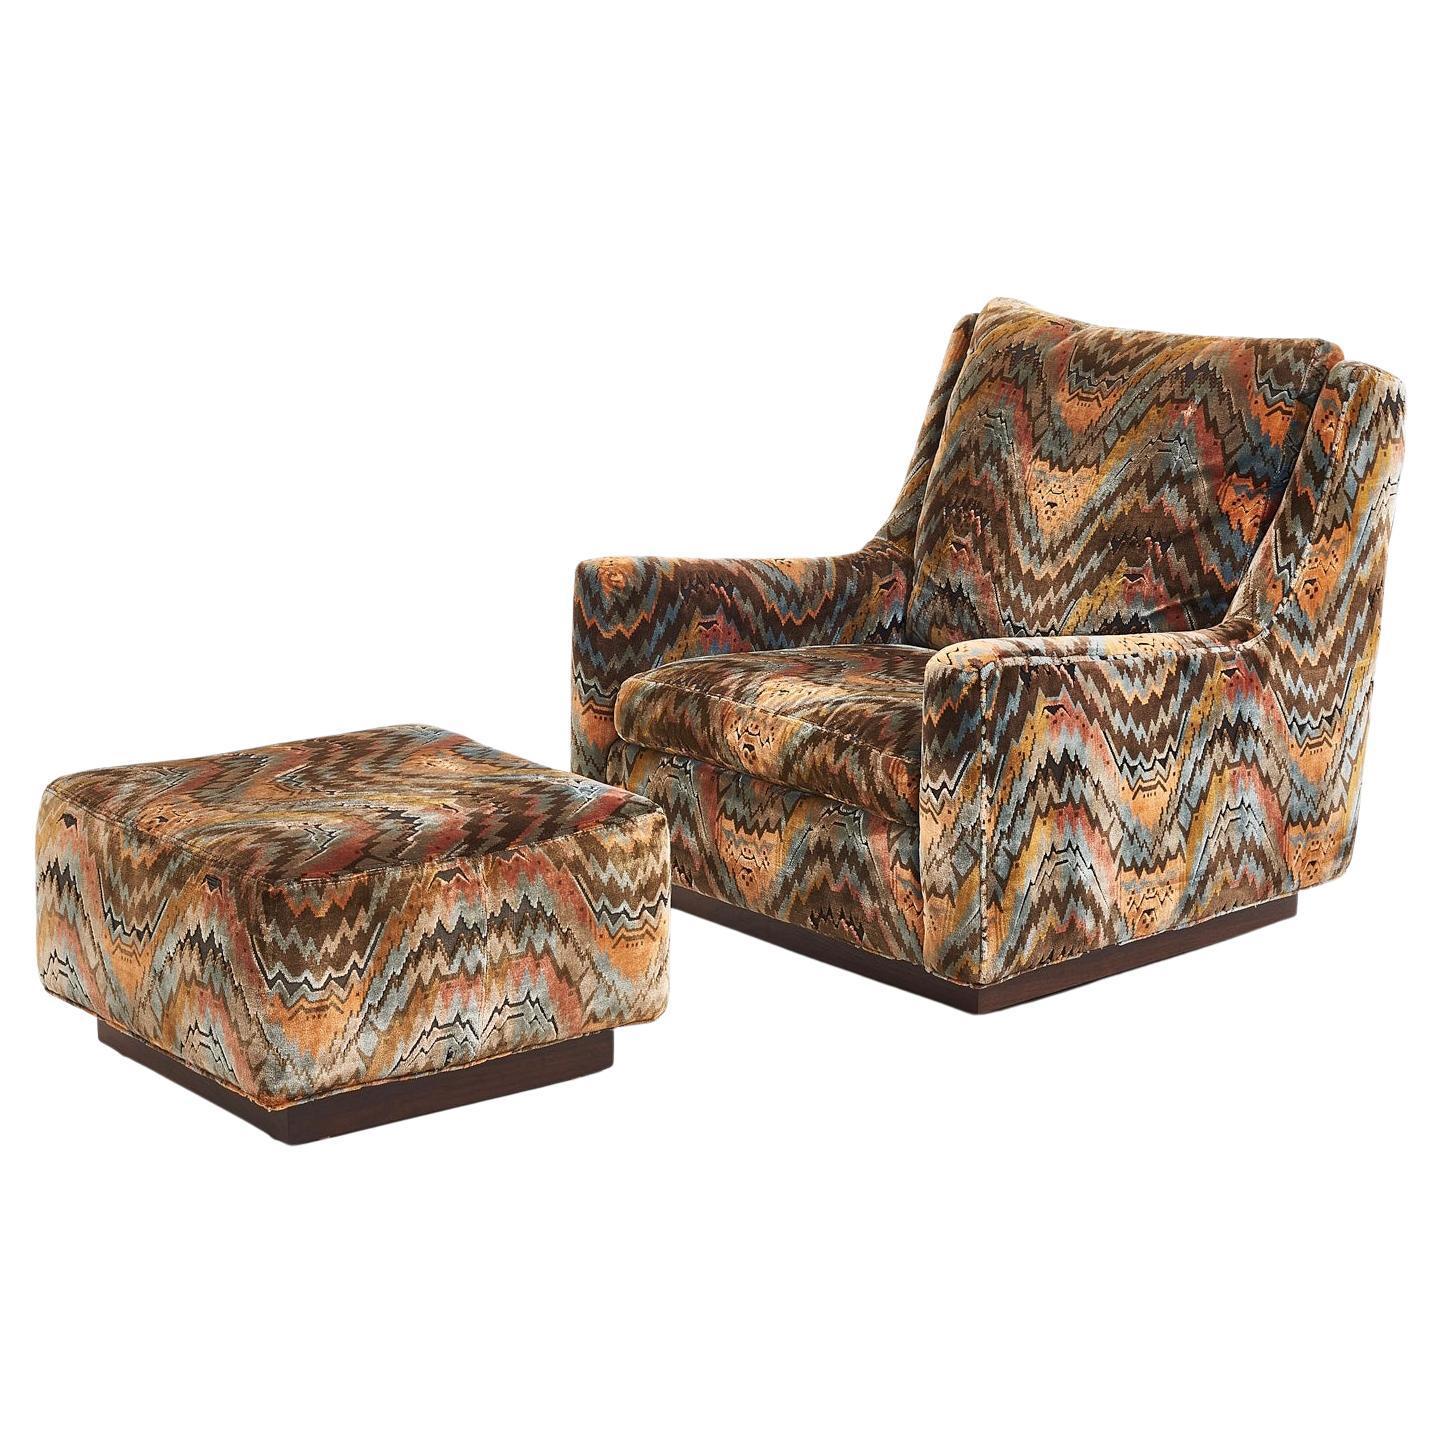 Milo Baughman Lounge Chair with Ottoman, 1970